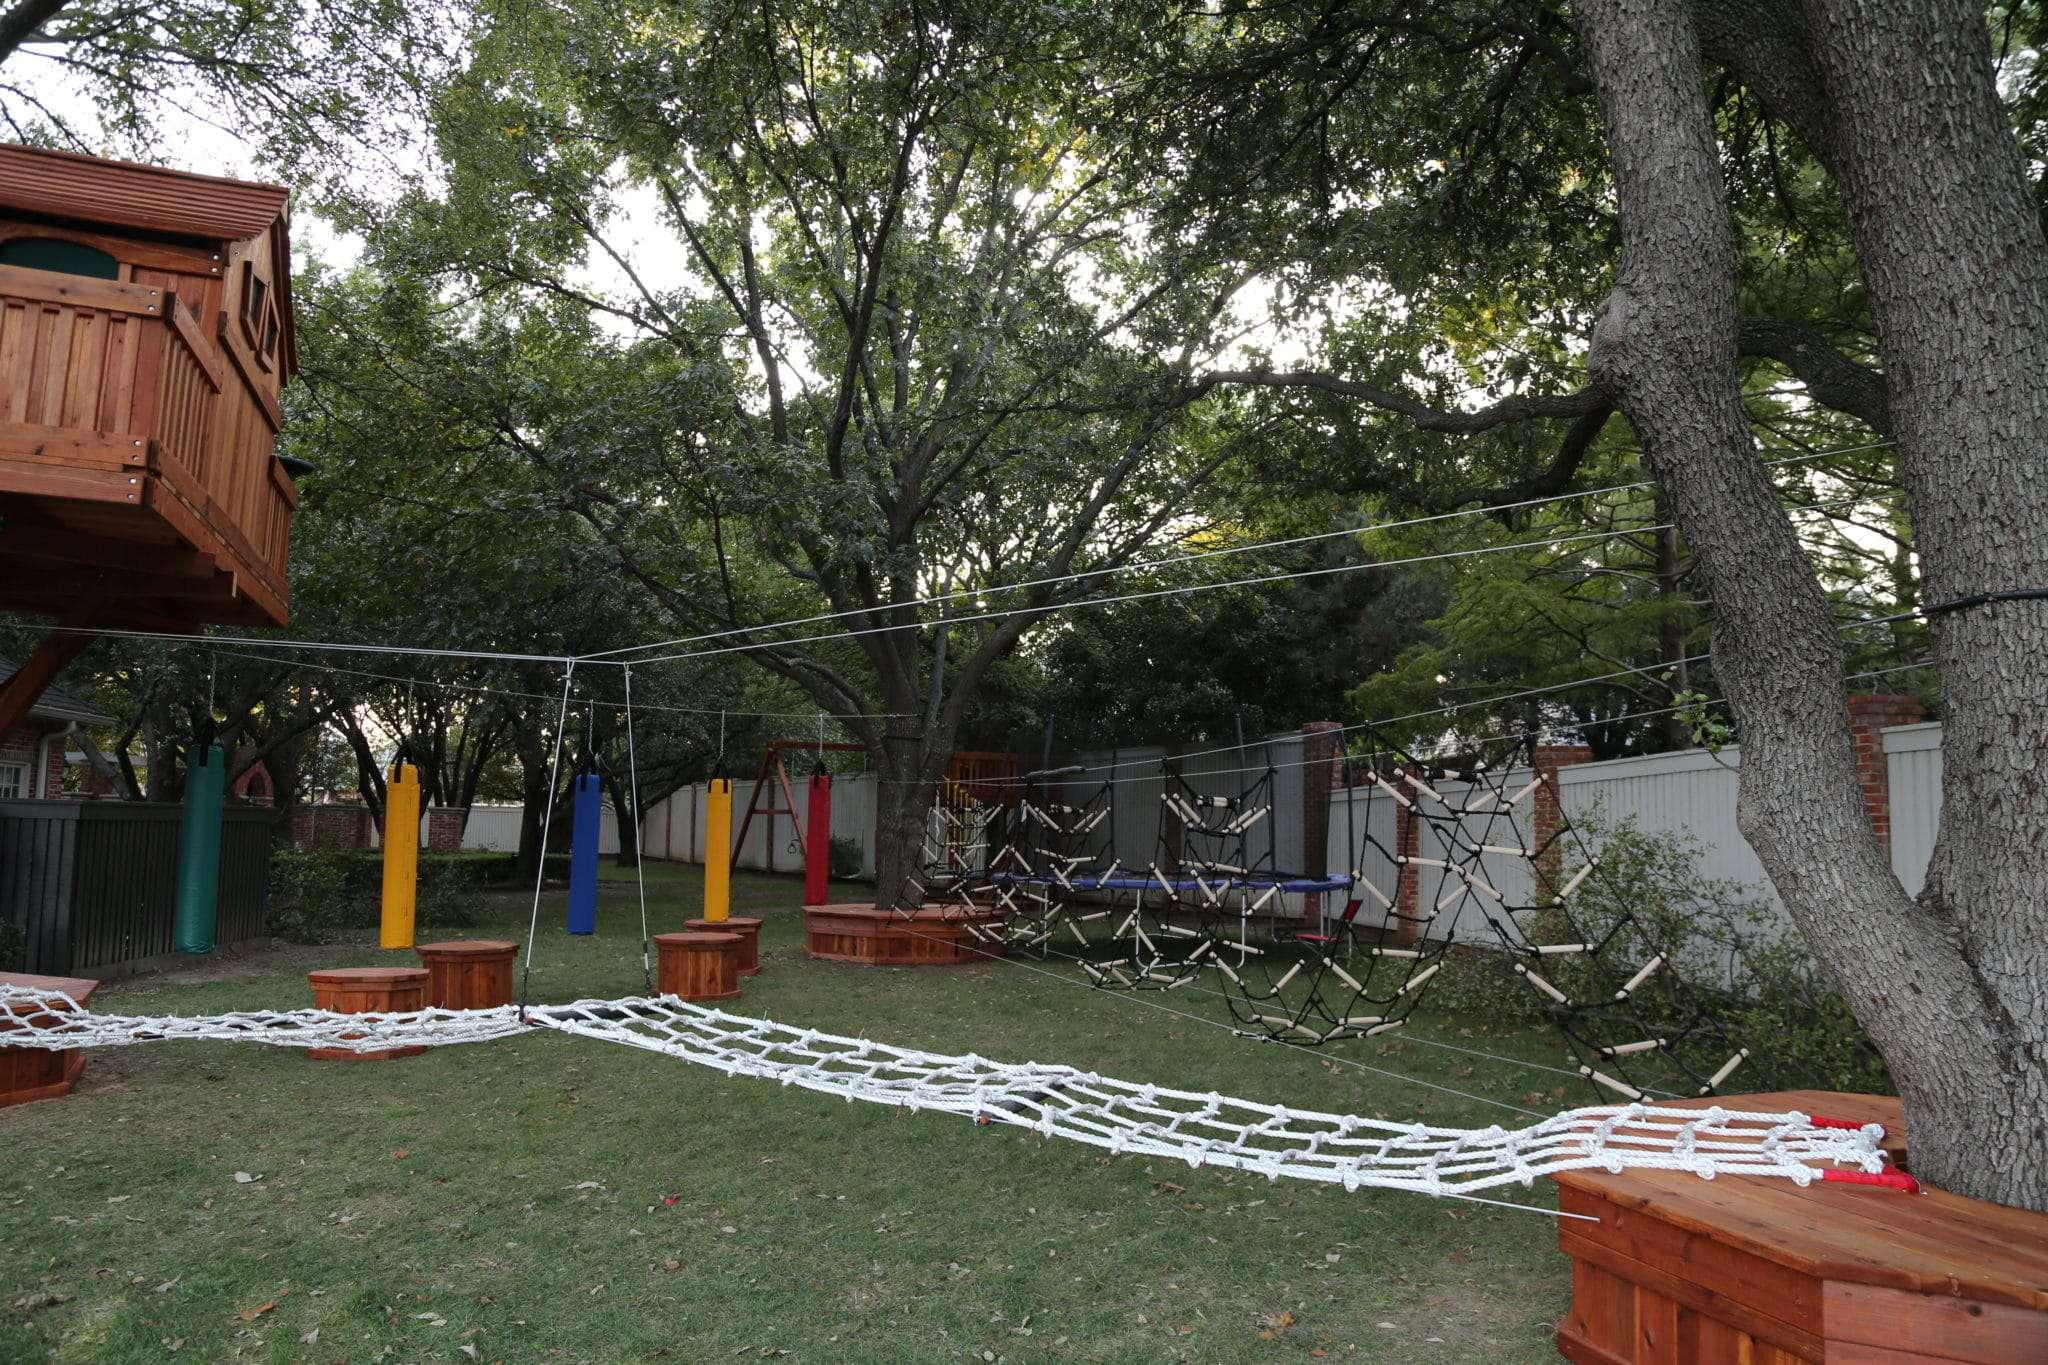 Go play outside, Ninja Warrior style!